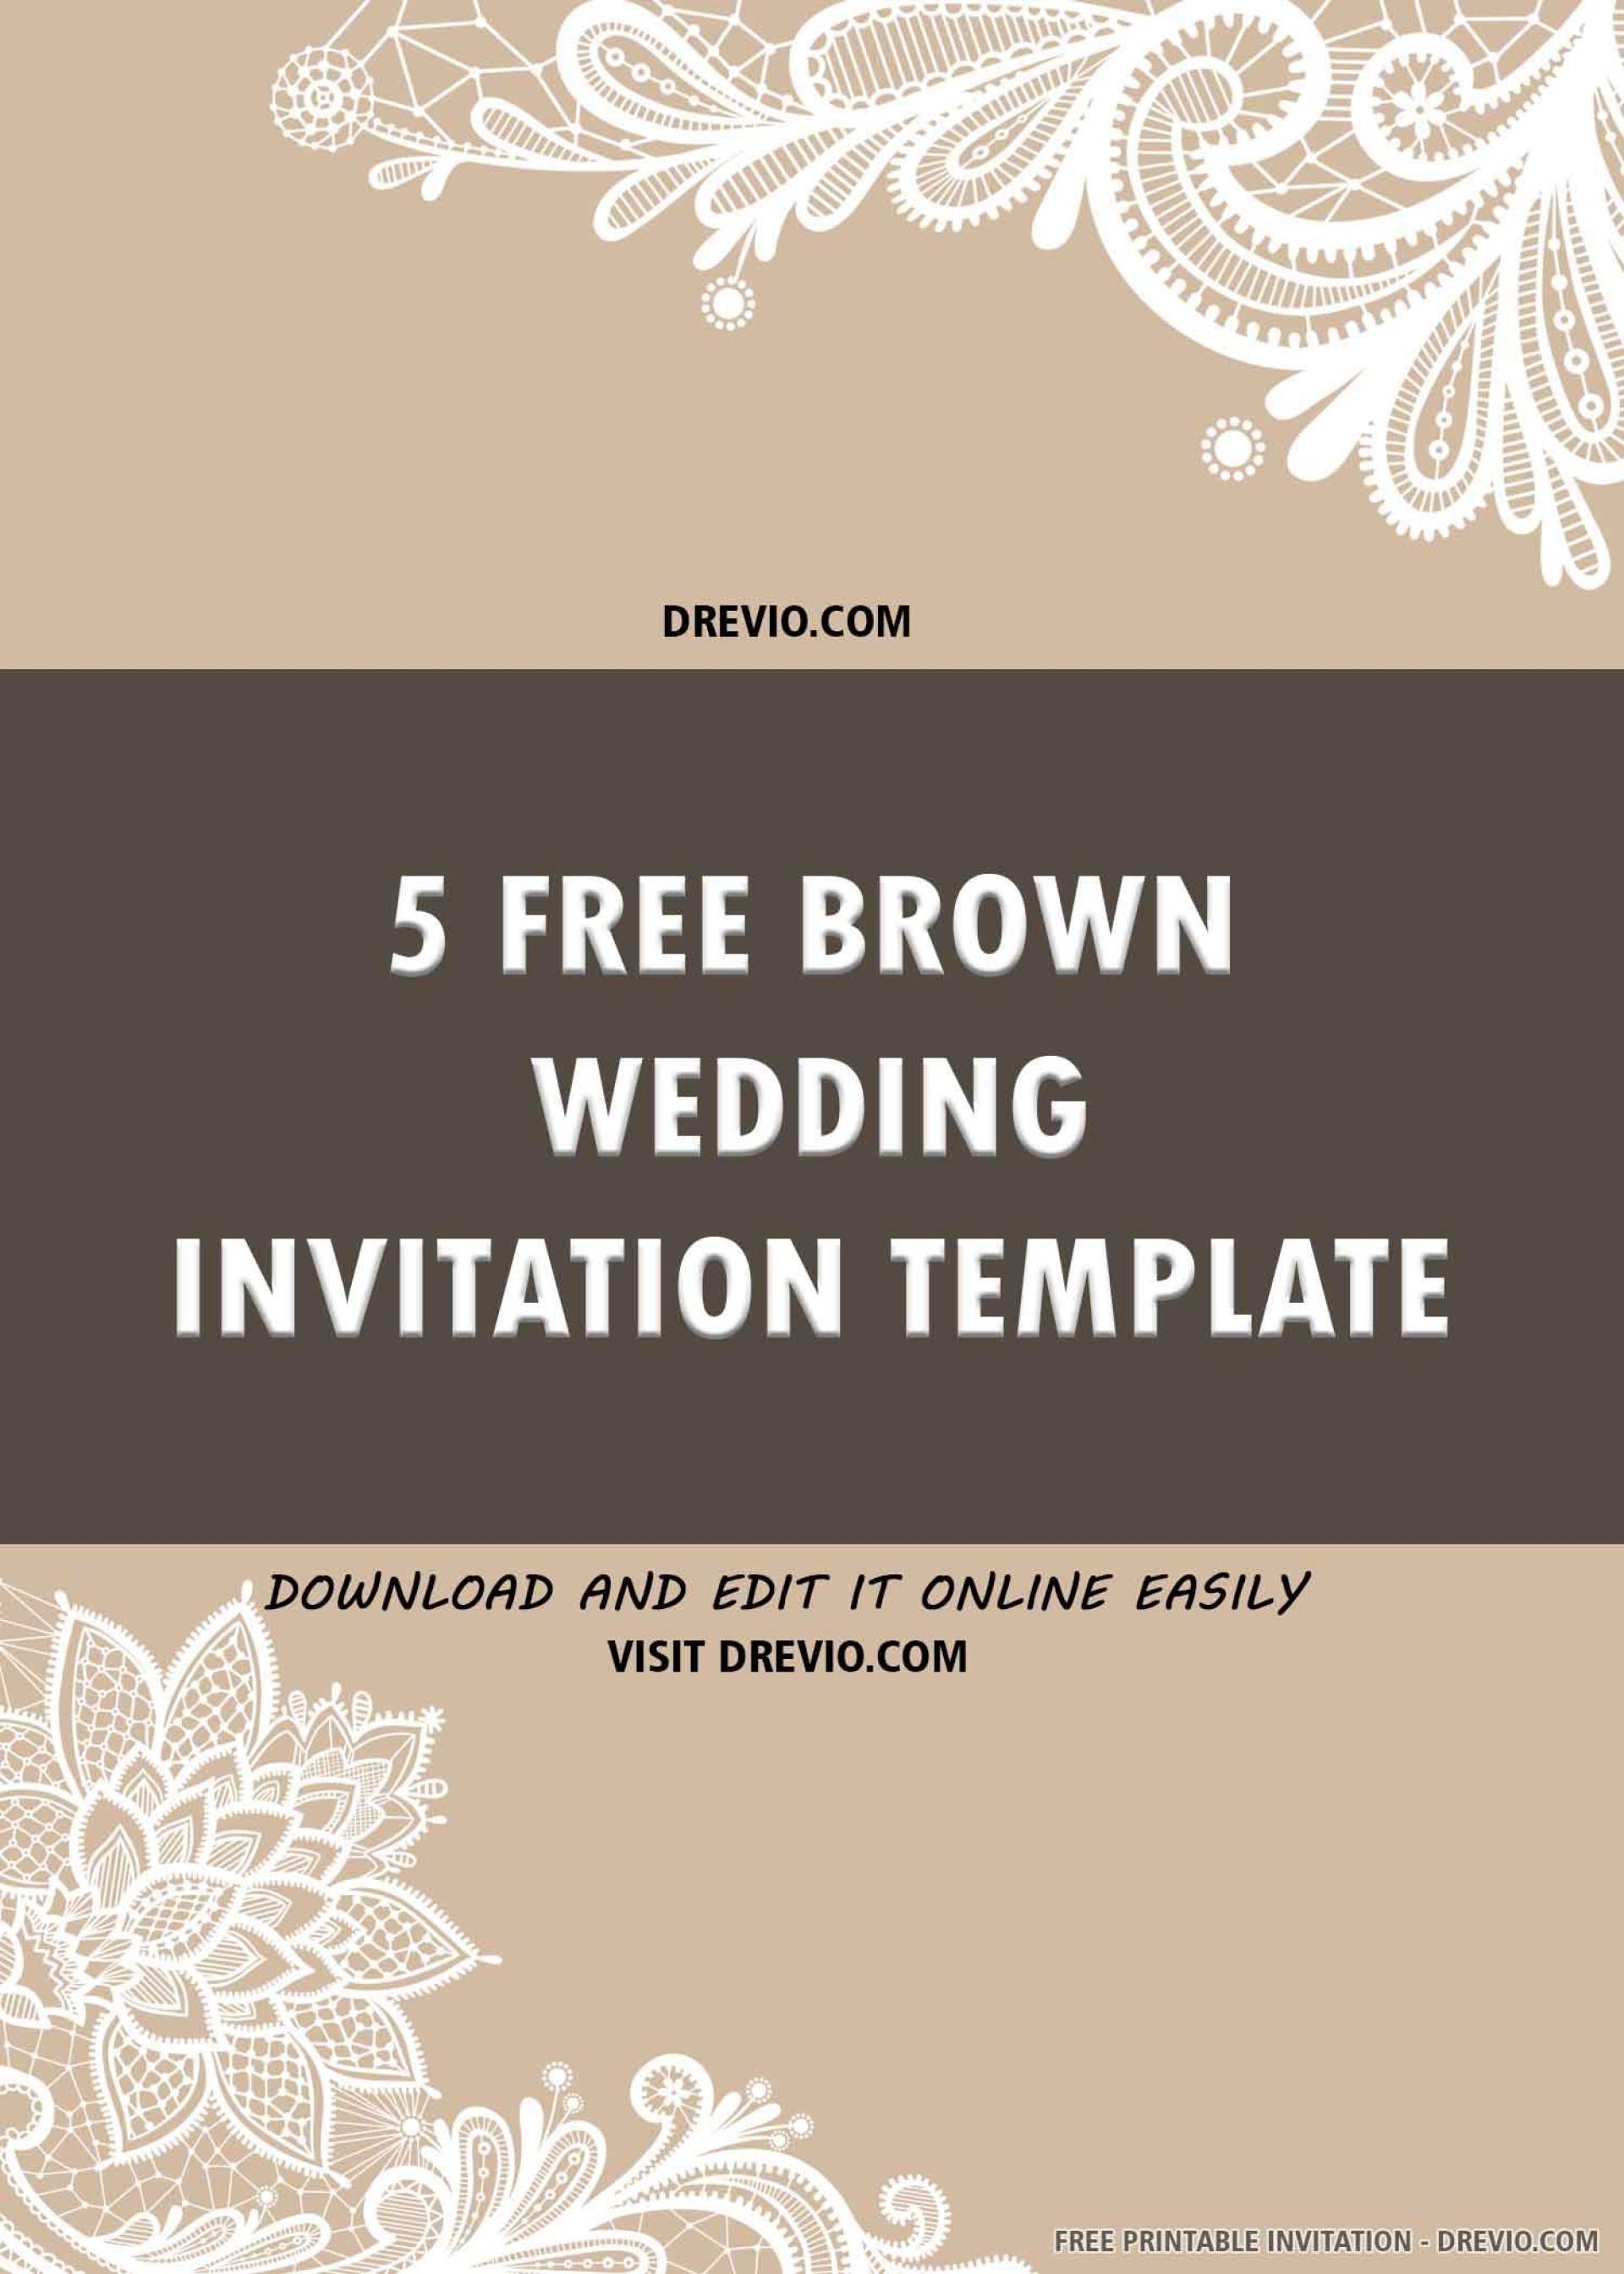 005 Surprising Free Wedding Invitation Template Printable Idea  For Microsoft Word Mac1920